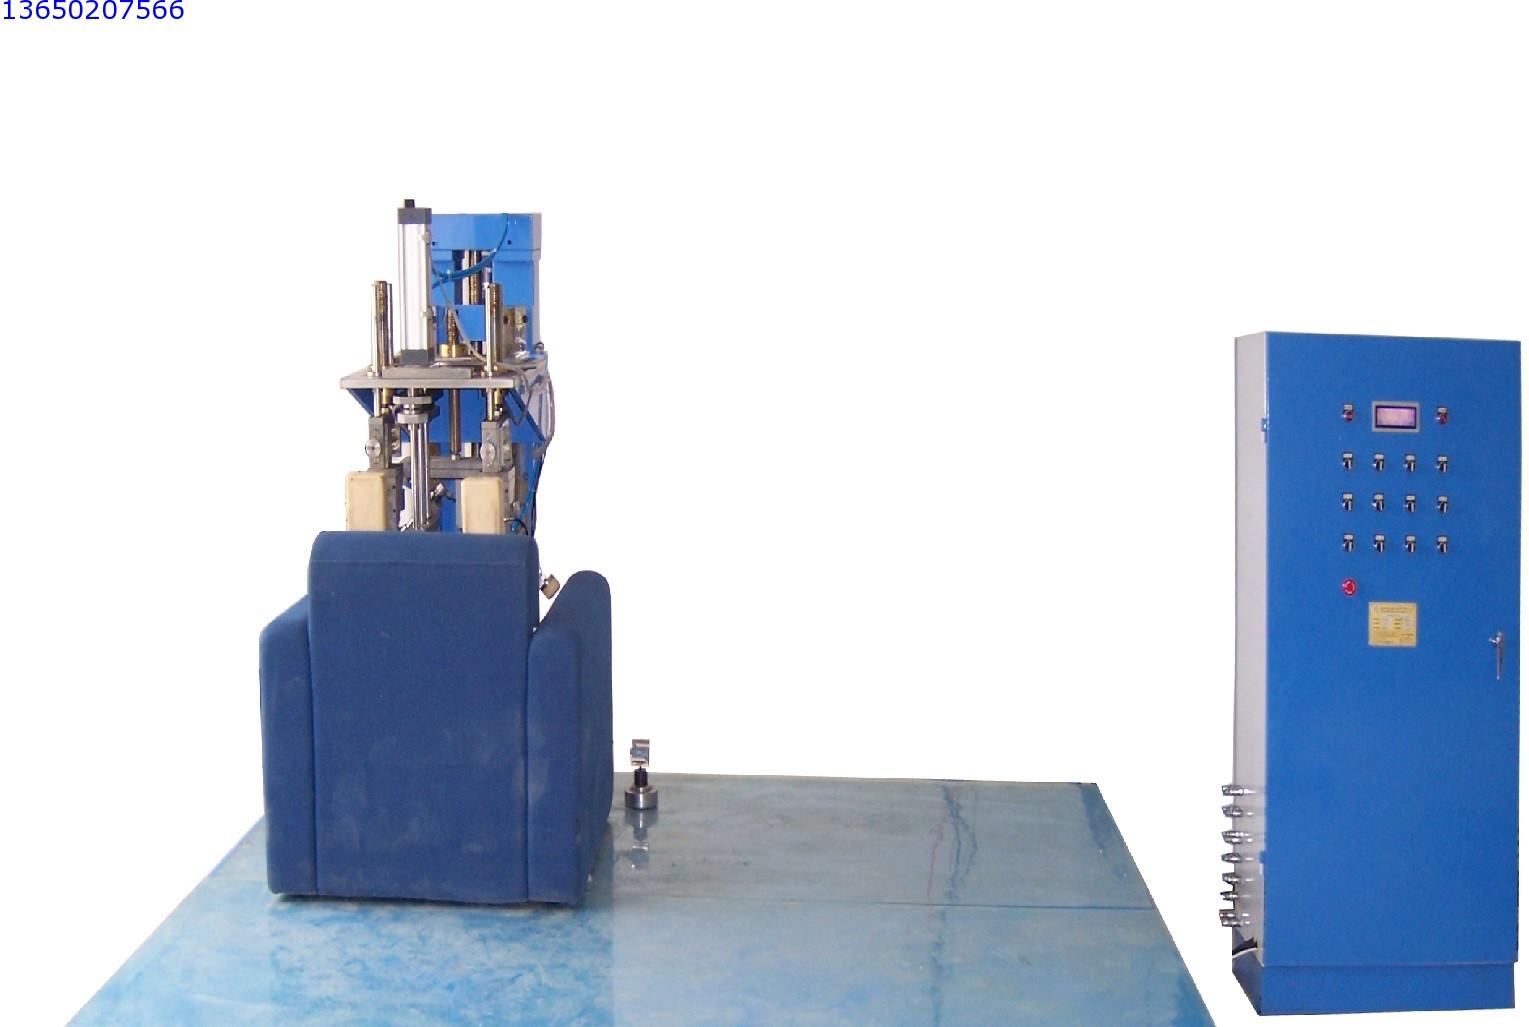 QI-J-010家具坐具测量仪